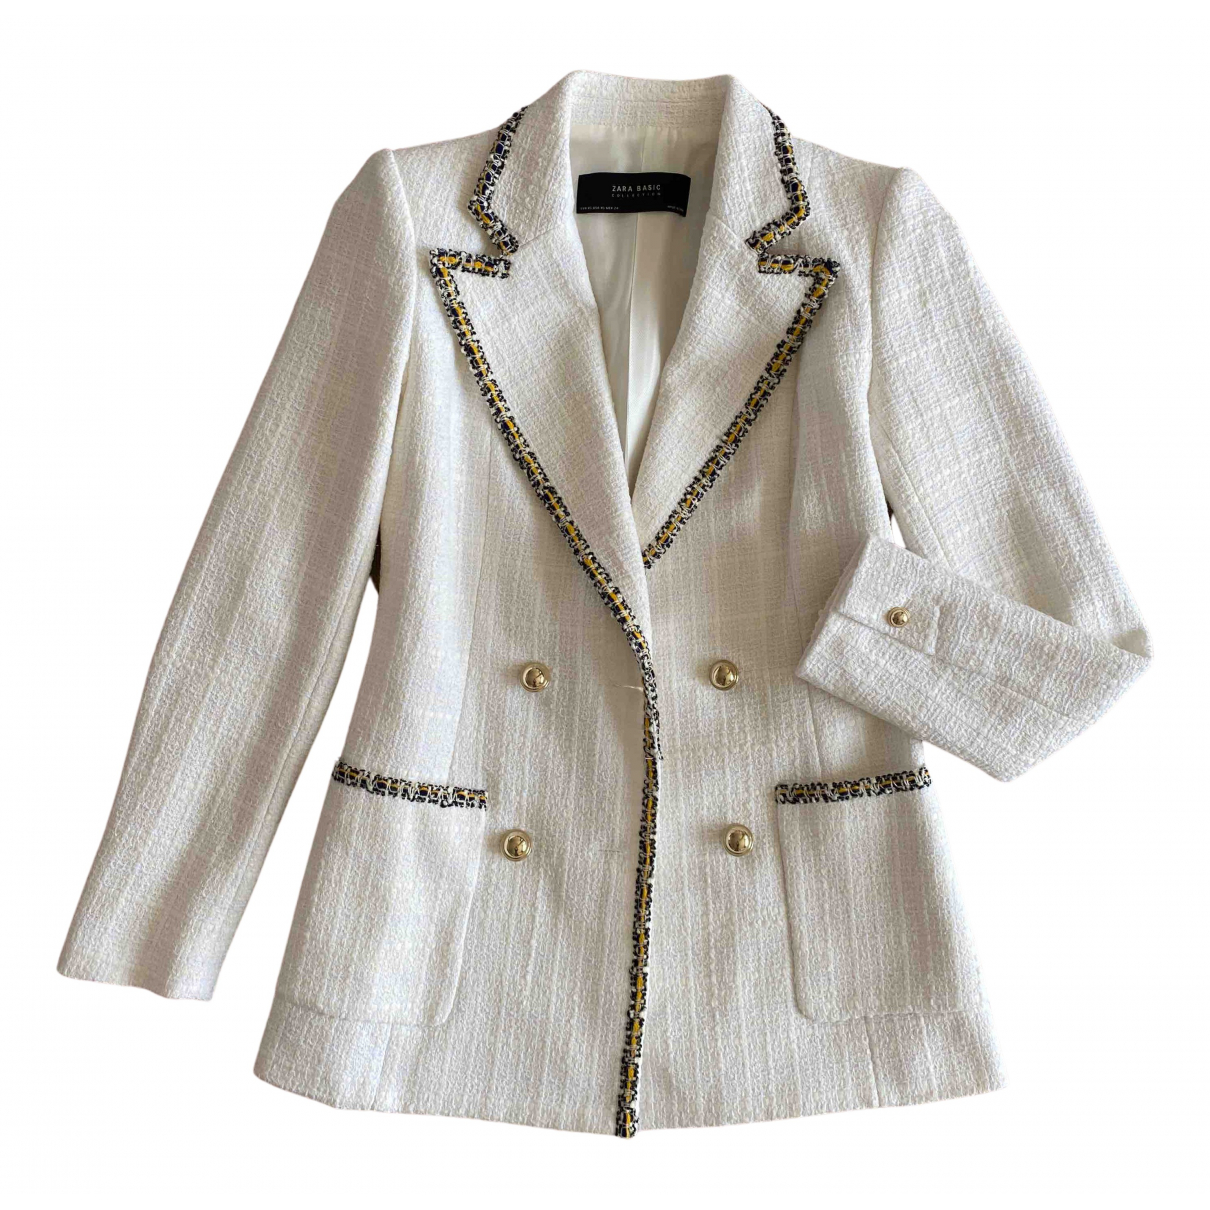 Zara - Veste   pour femme en tweed - blanc